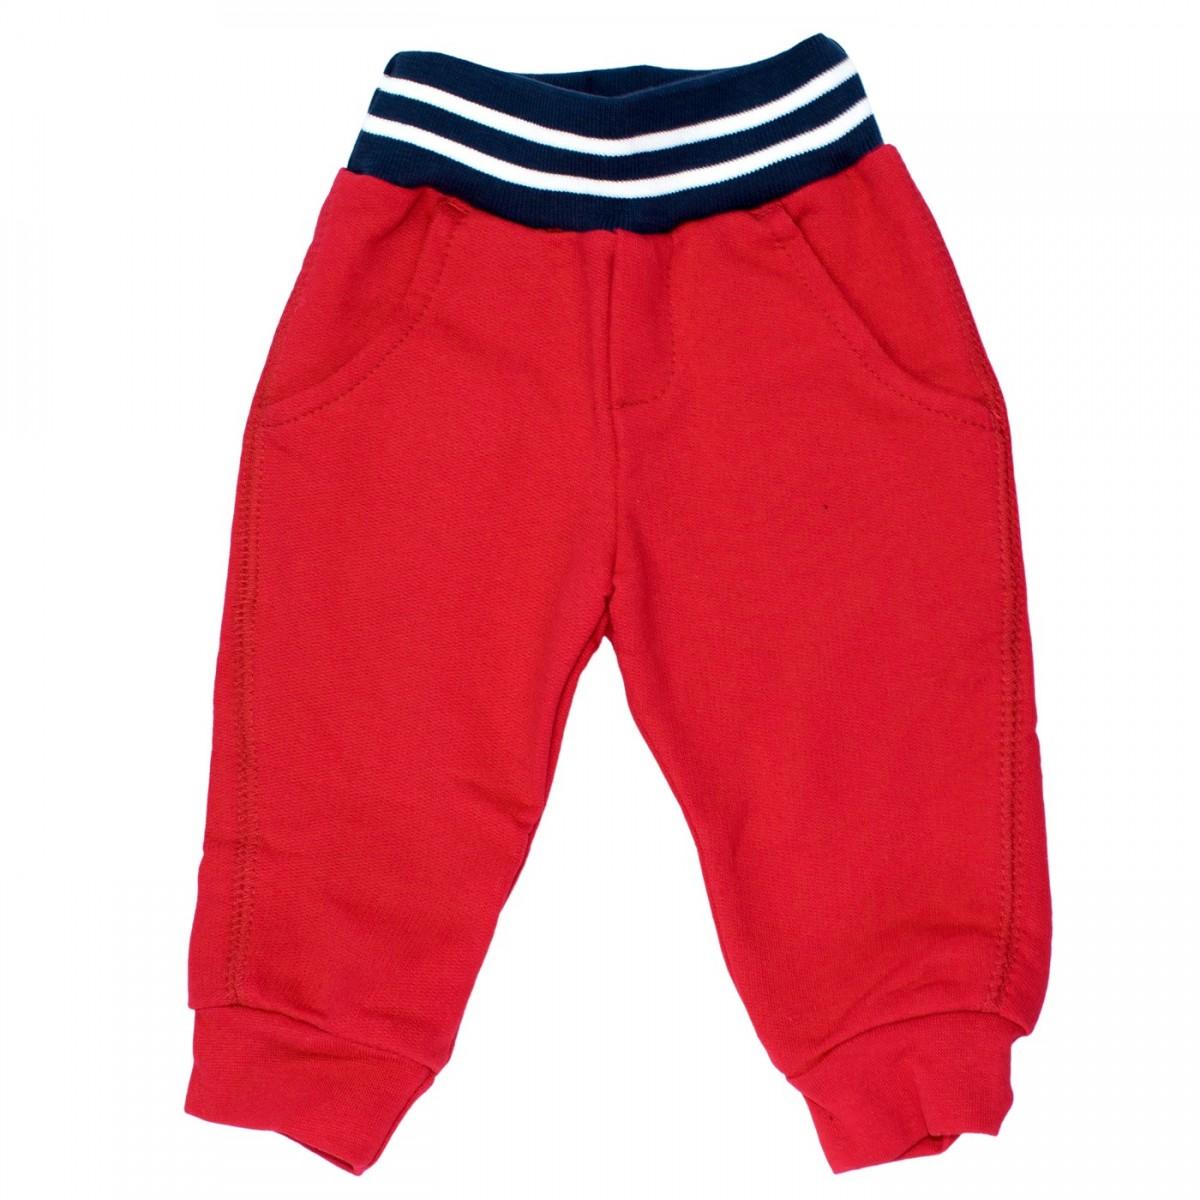 5c9f1ef86 Bizz Store - Calça Infantil Bebê Menino Hering Kids Moletom